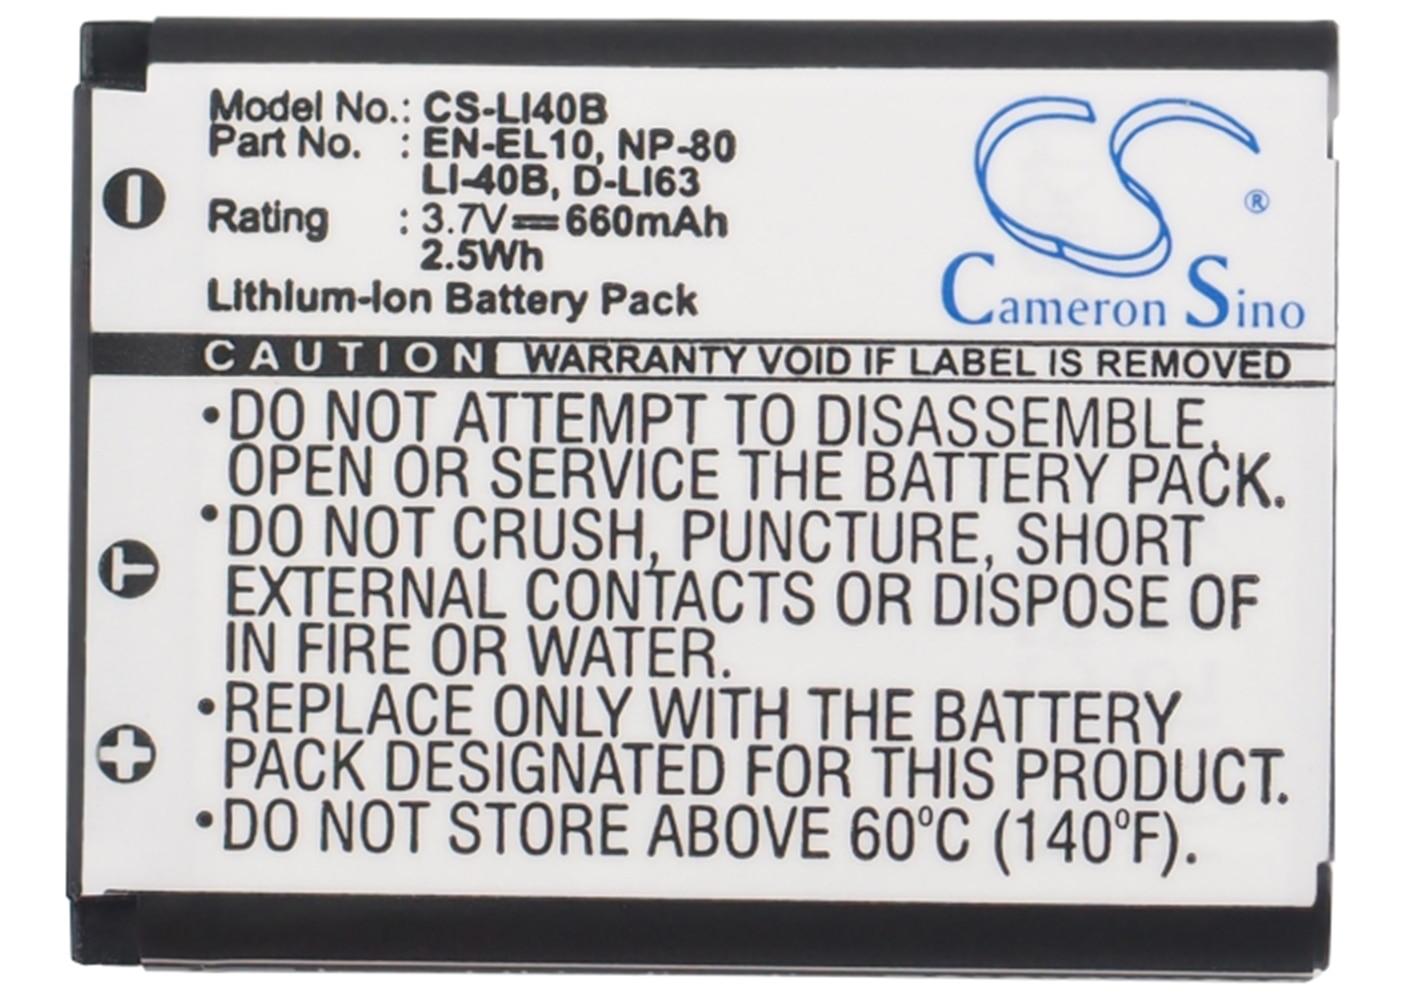 Аккумулятор Cameron Sino 660 мА для Nikon Coolpix S230,Coolpix S3000,Coolpix S4000,Coolpix S500,Coolpix S510